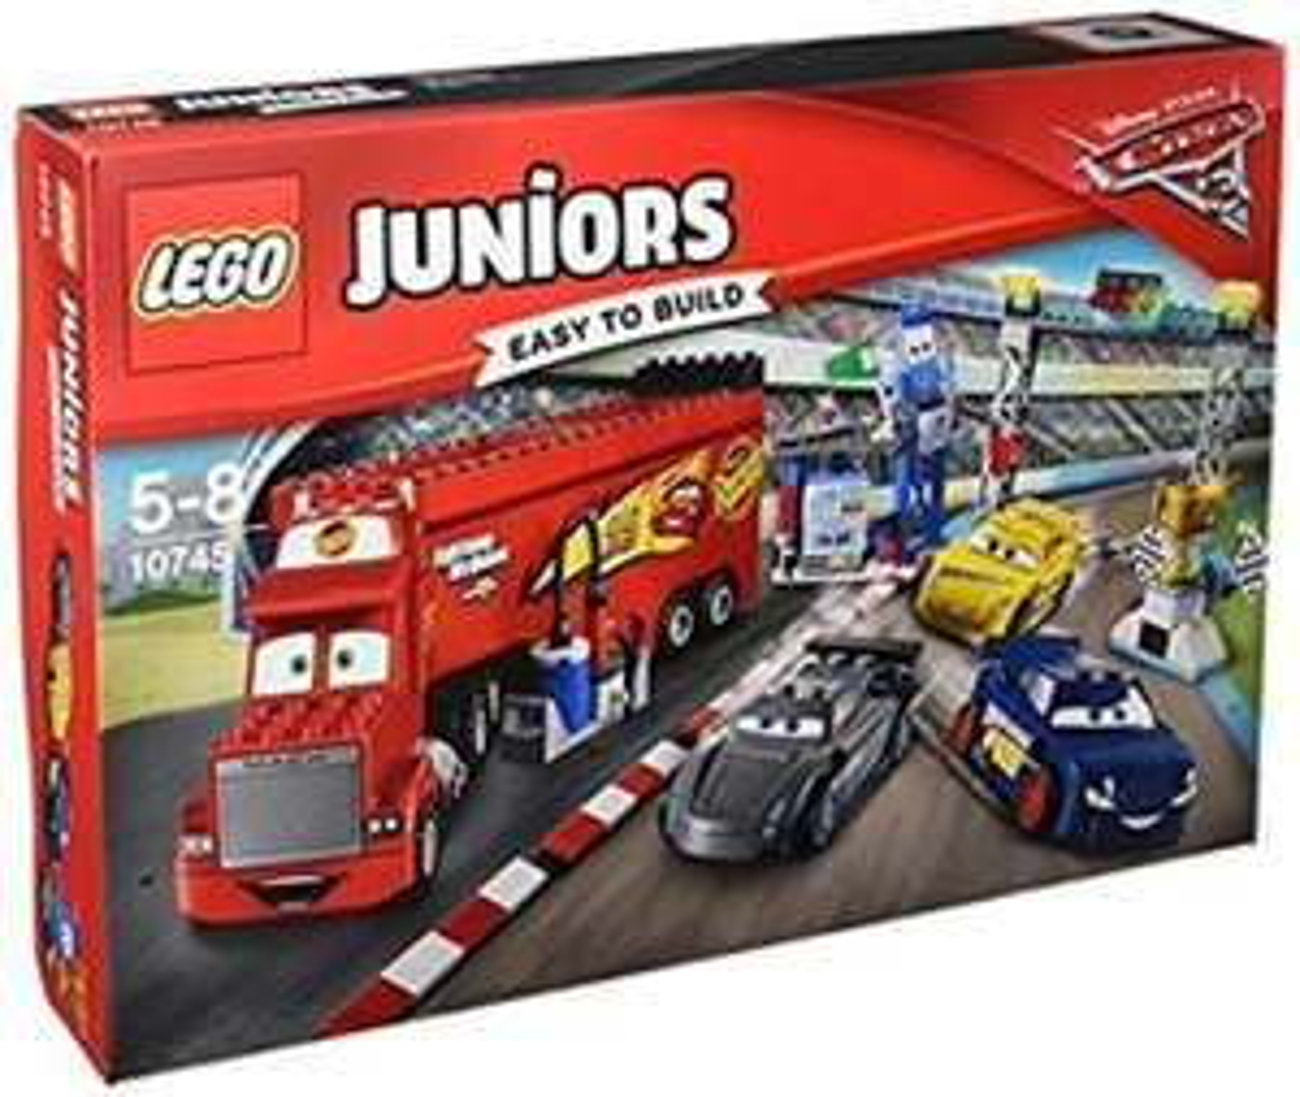 LEGO 10745 Florida 500 Final Race Toy £27.99 Del @ Amazon